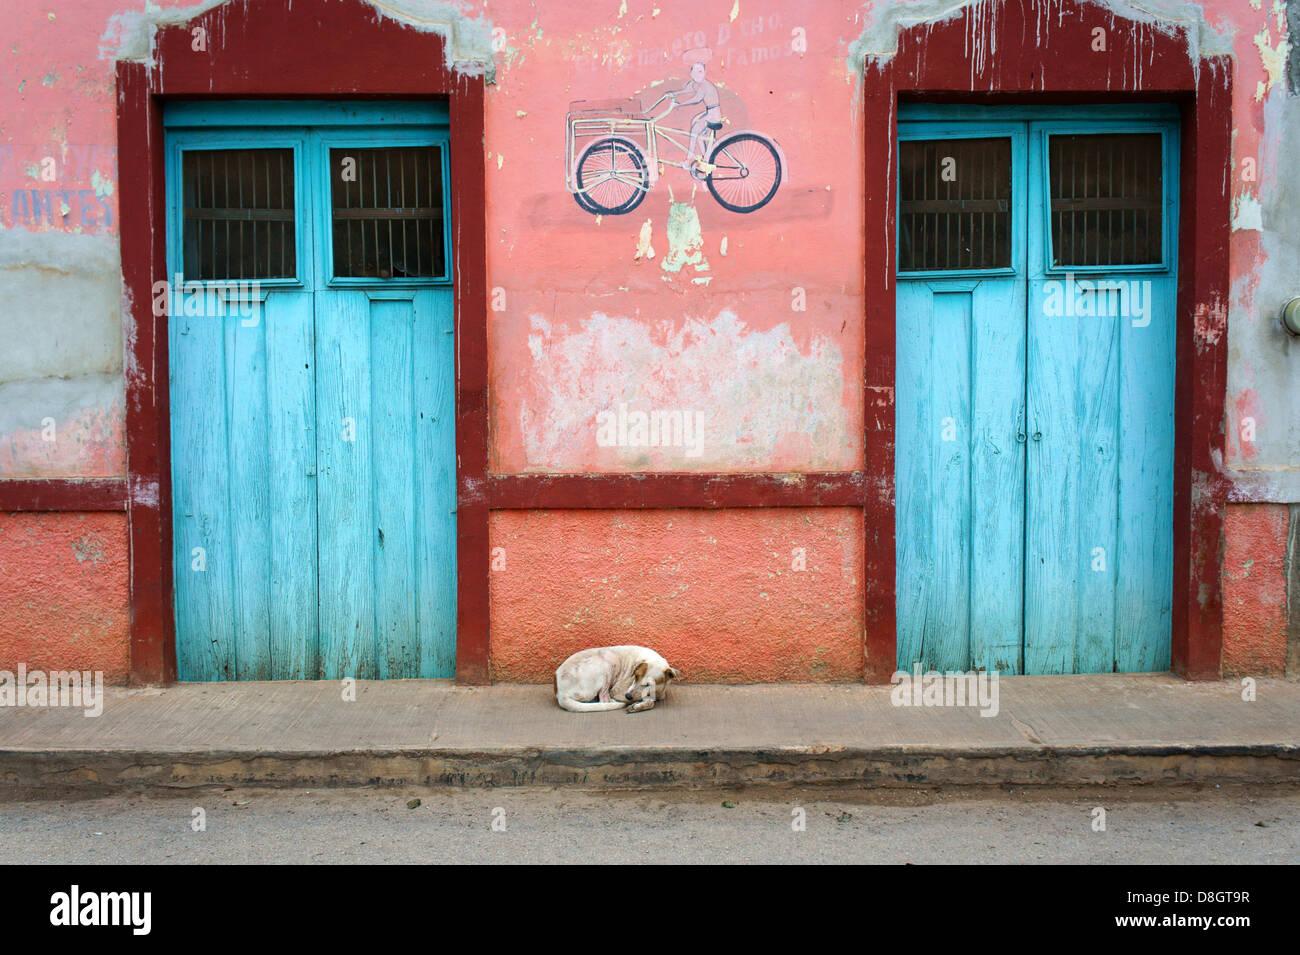 Stray dog sleeping in the sidewalk in Santa Elena, Yucatan, Mexico - Stock Image